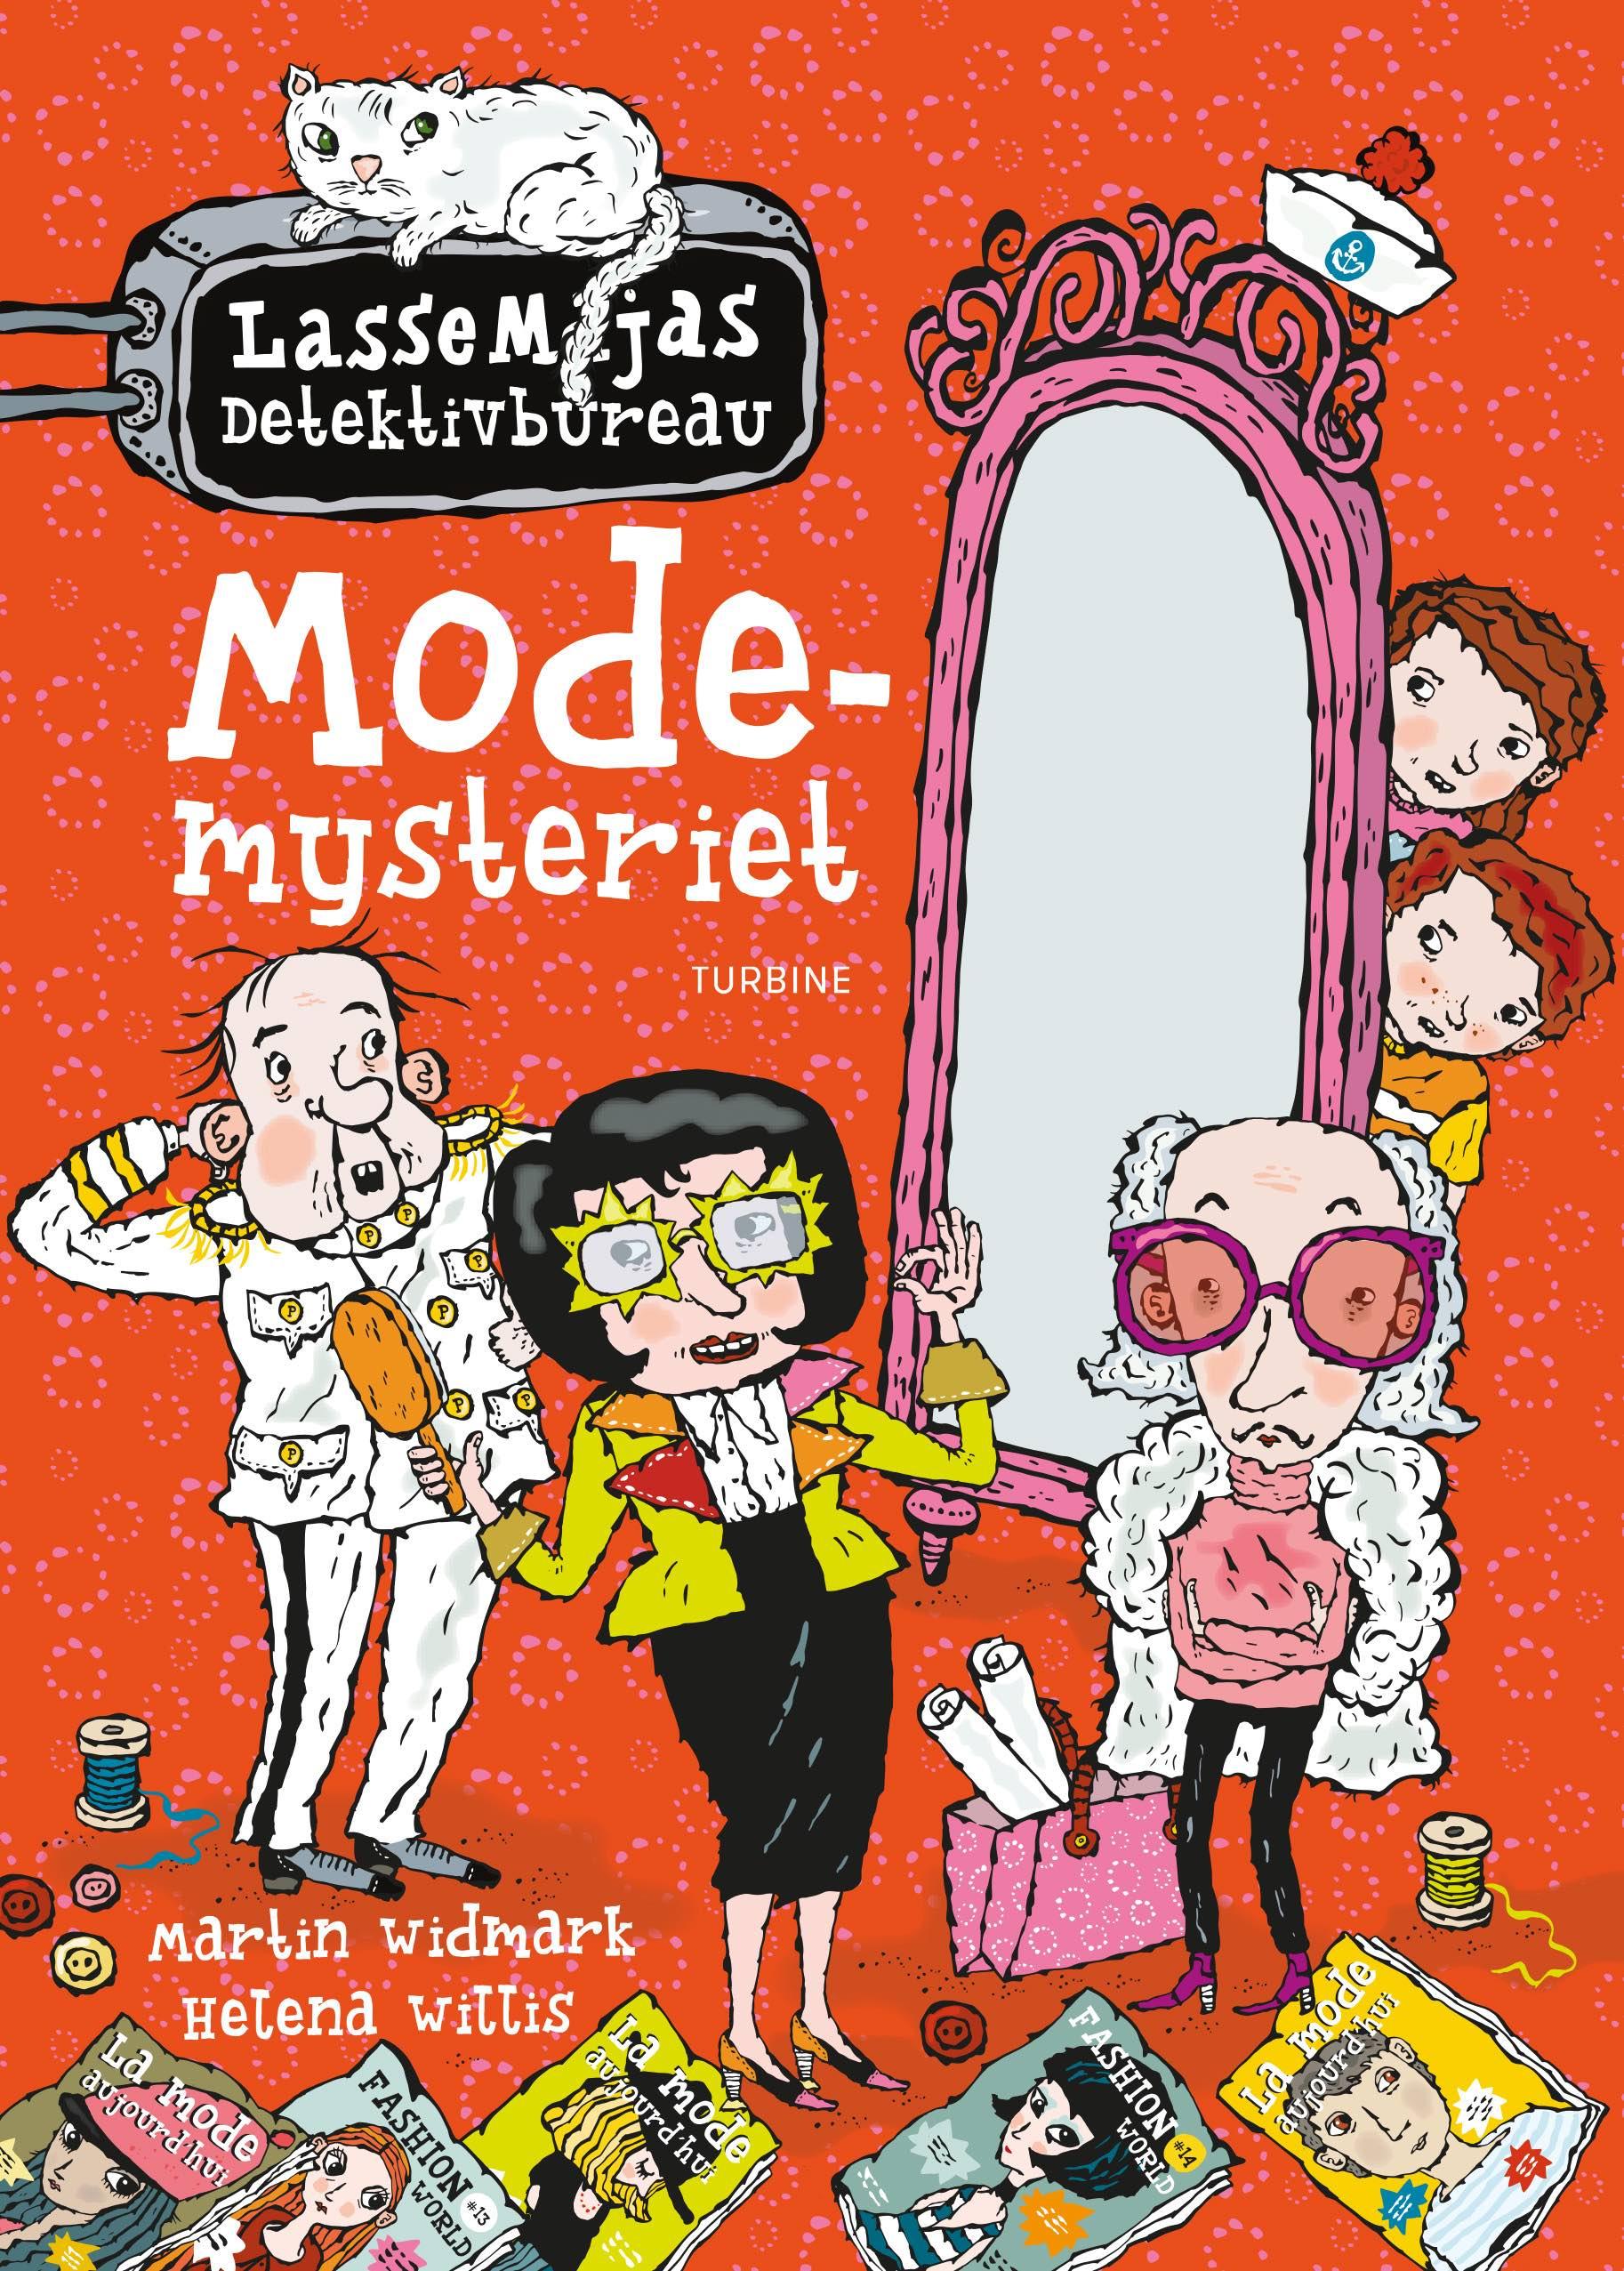 Modemysteriet - Martin Widmark - Bøger - Turbine - 9788740618006 - January 19, 2018